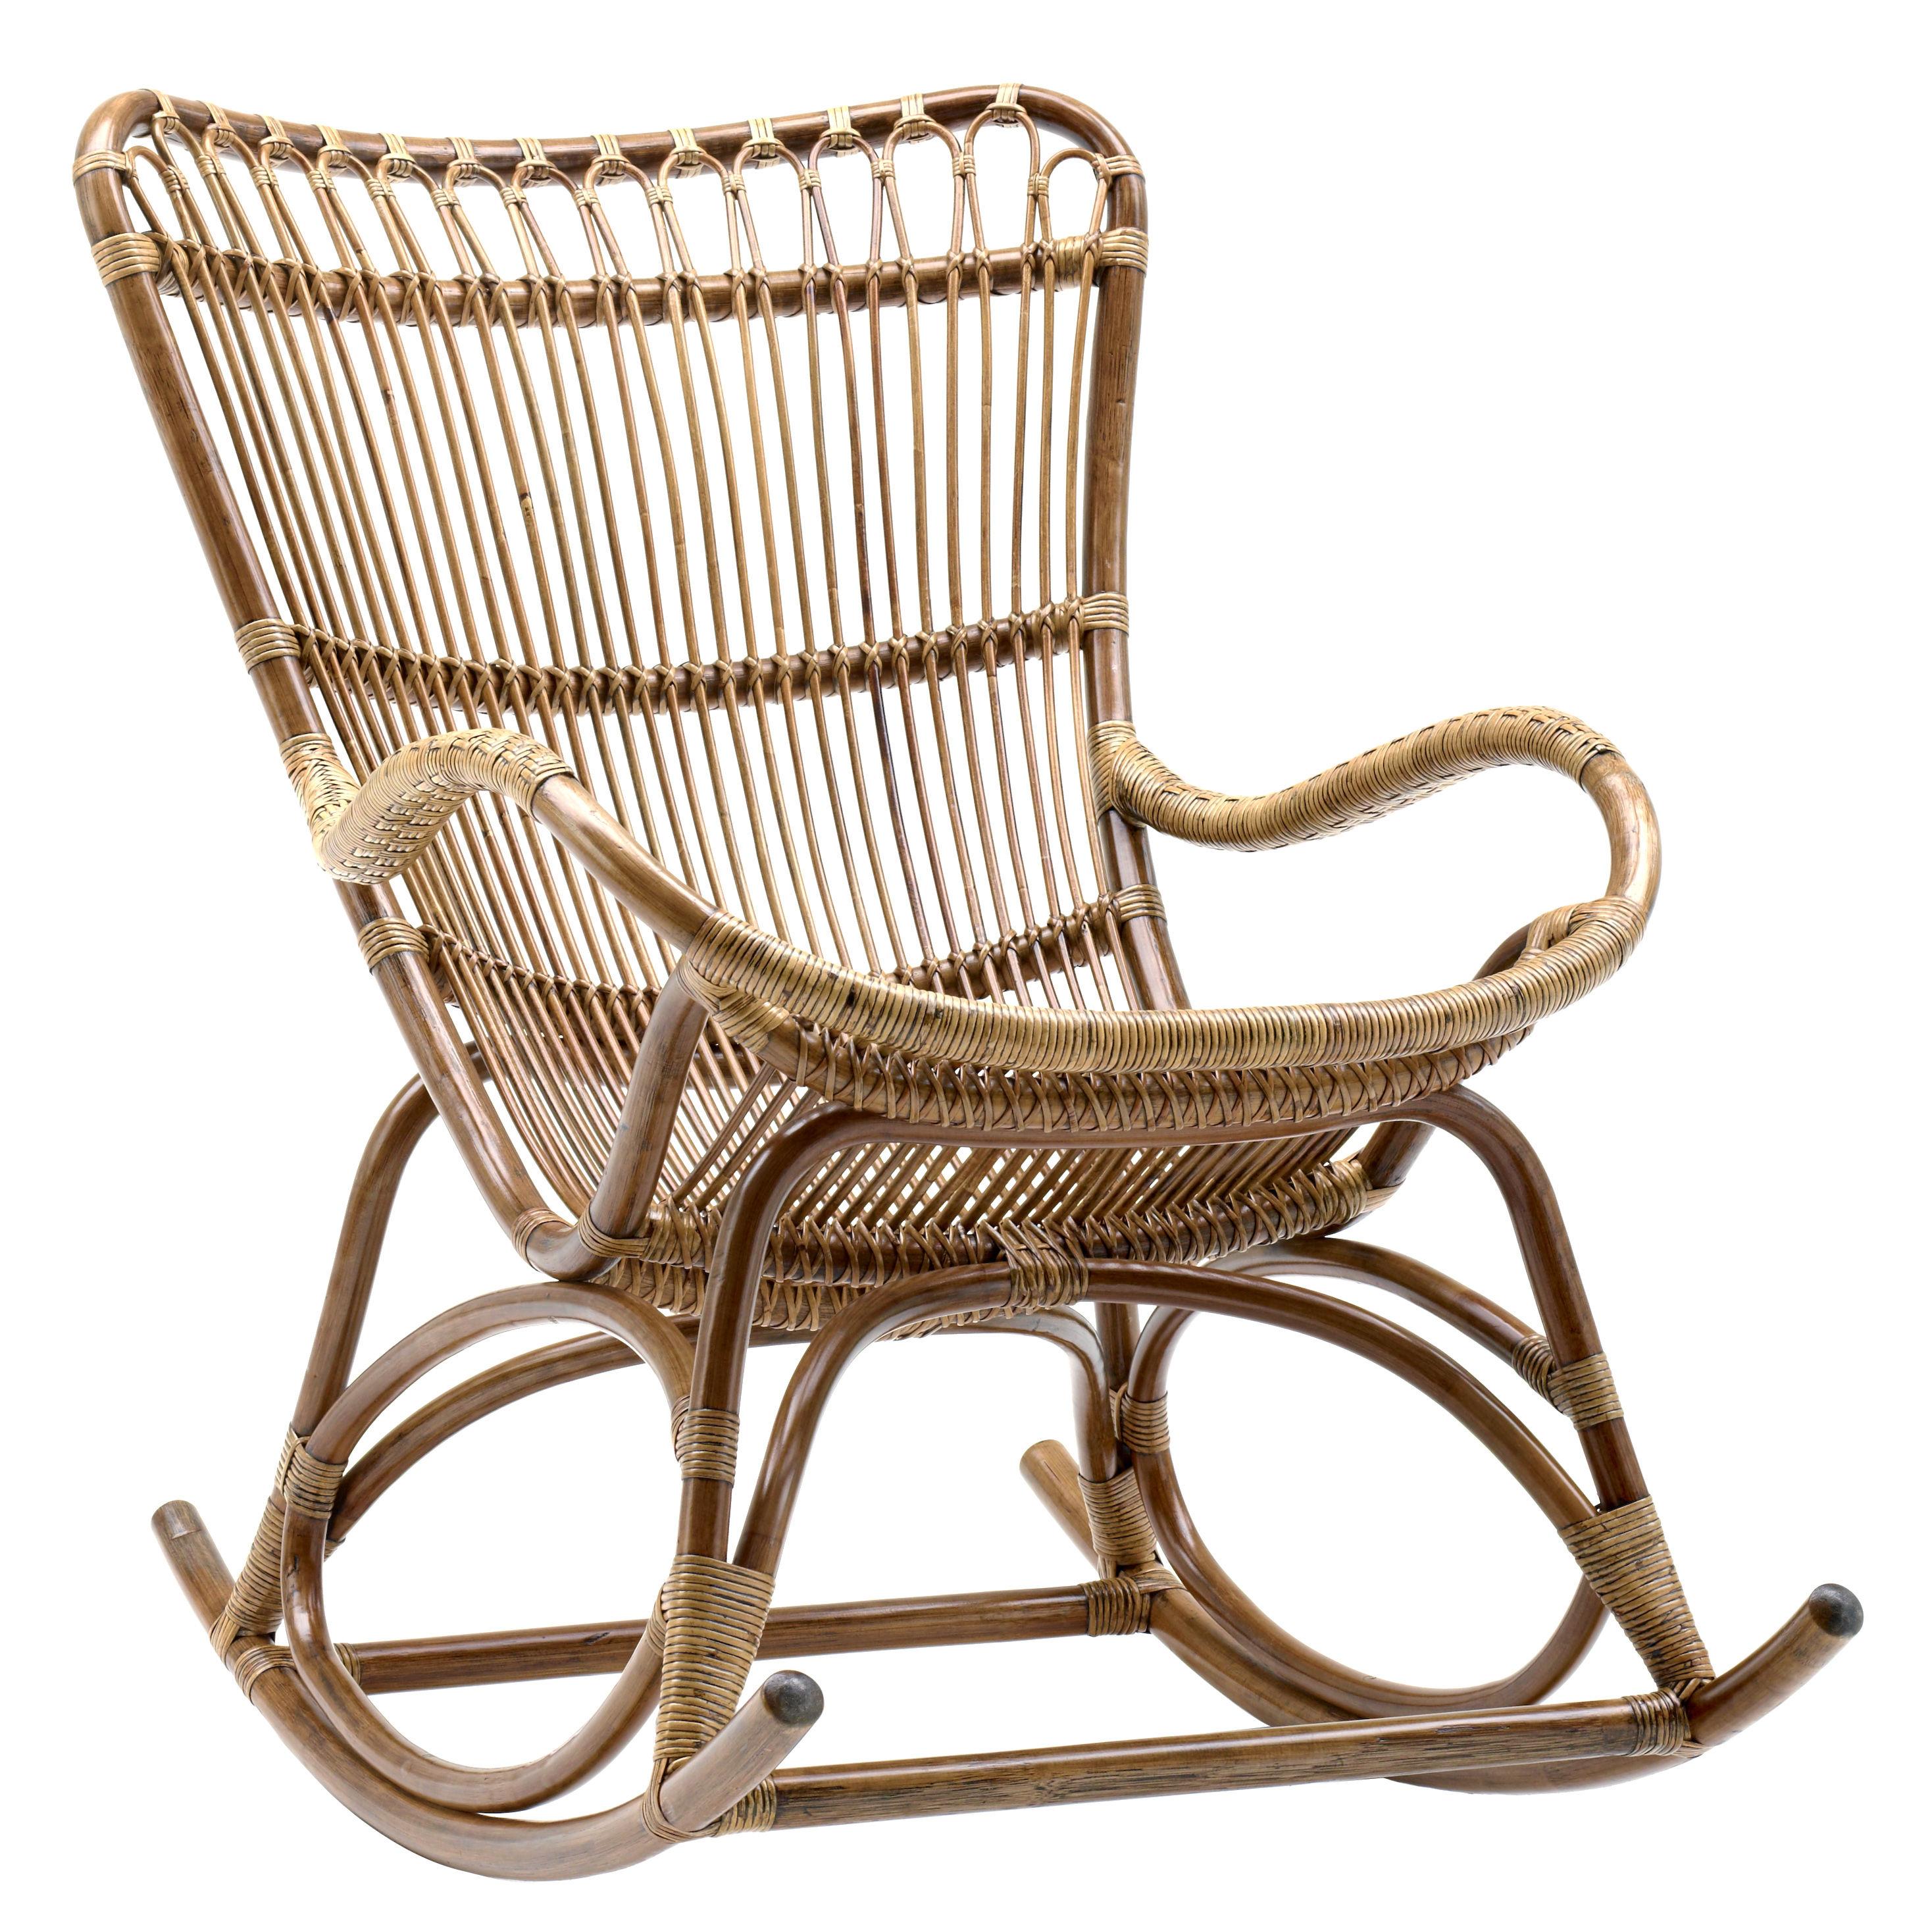 Möbel - Lounge Sessel - Monet Schaukelstuhl - Sika Design - Antik-Optik - Rattan